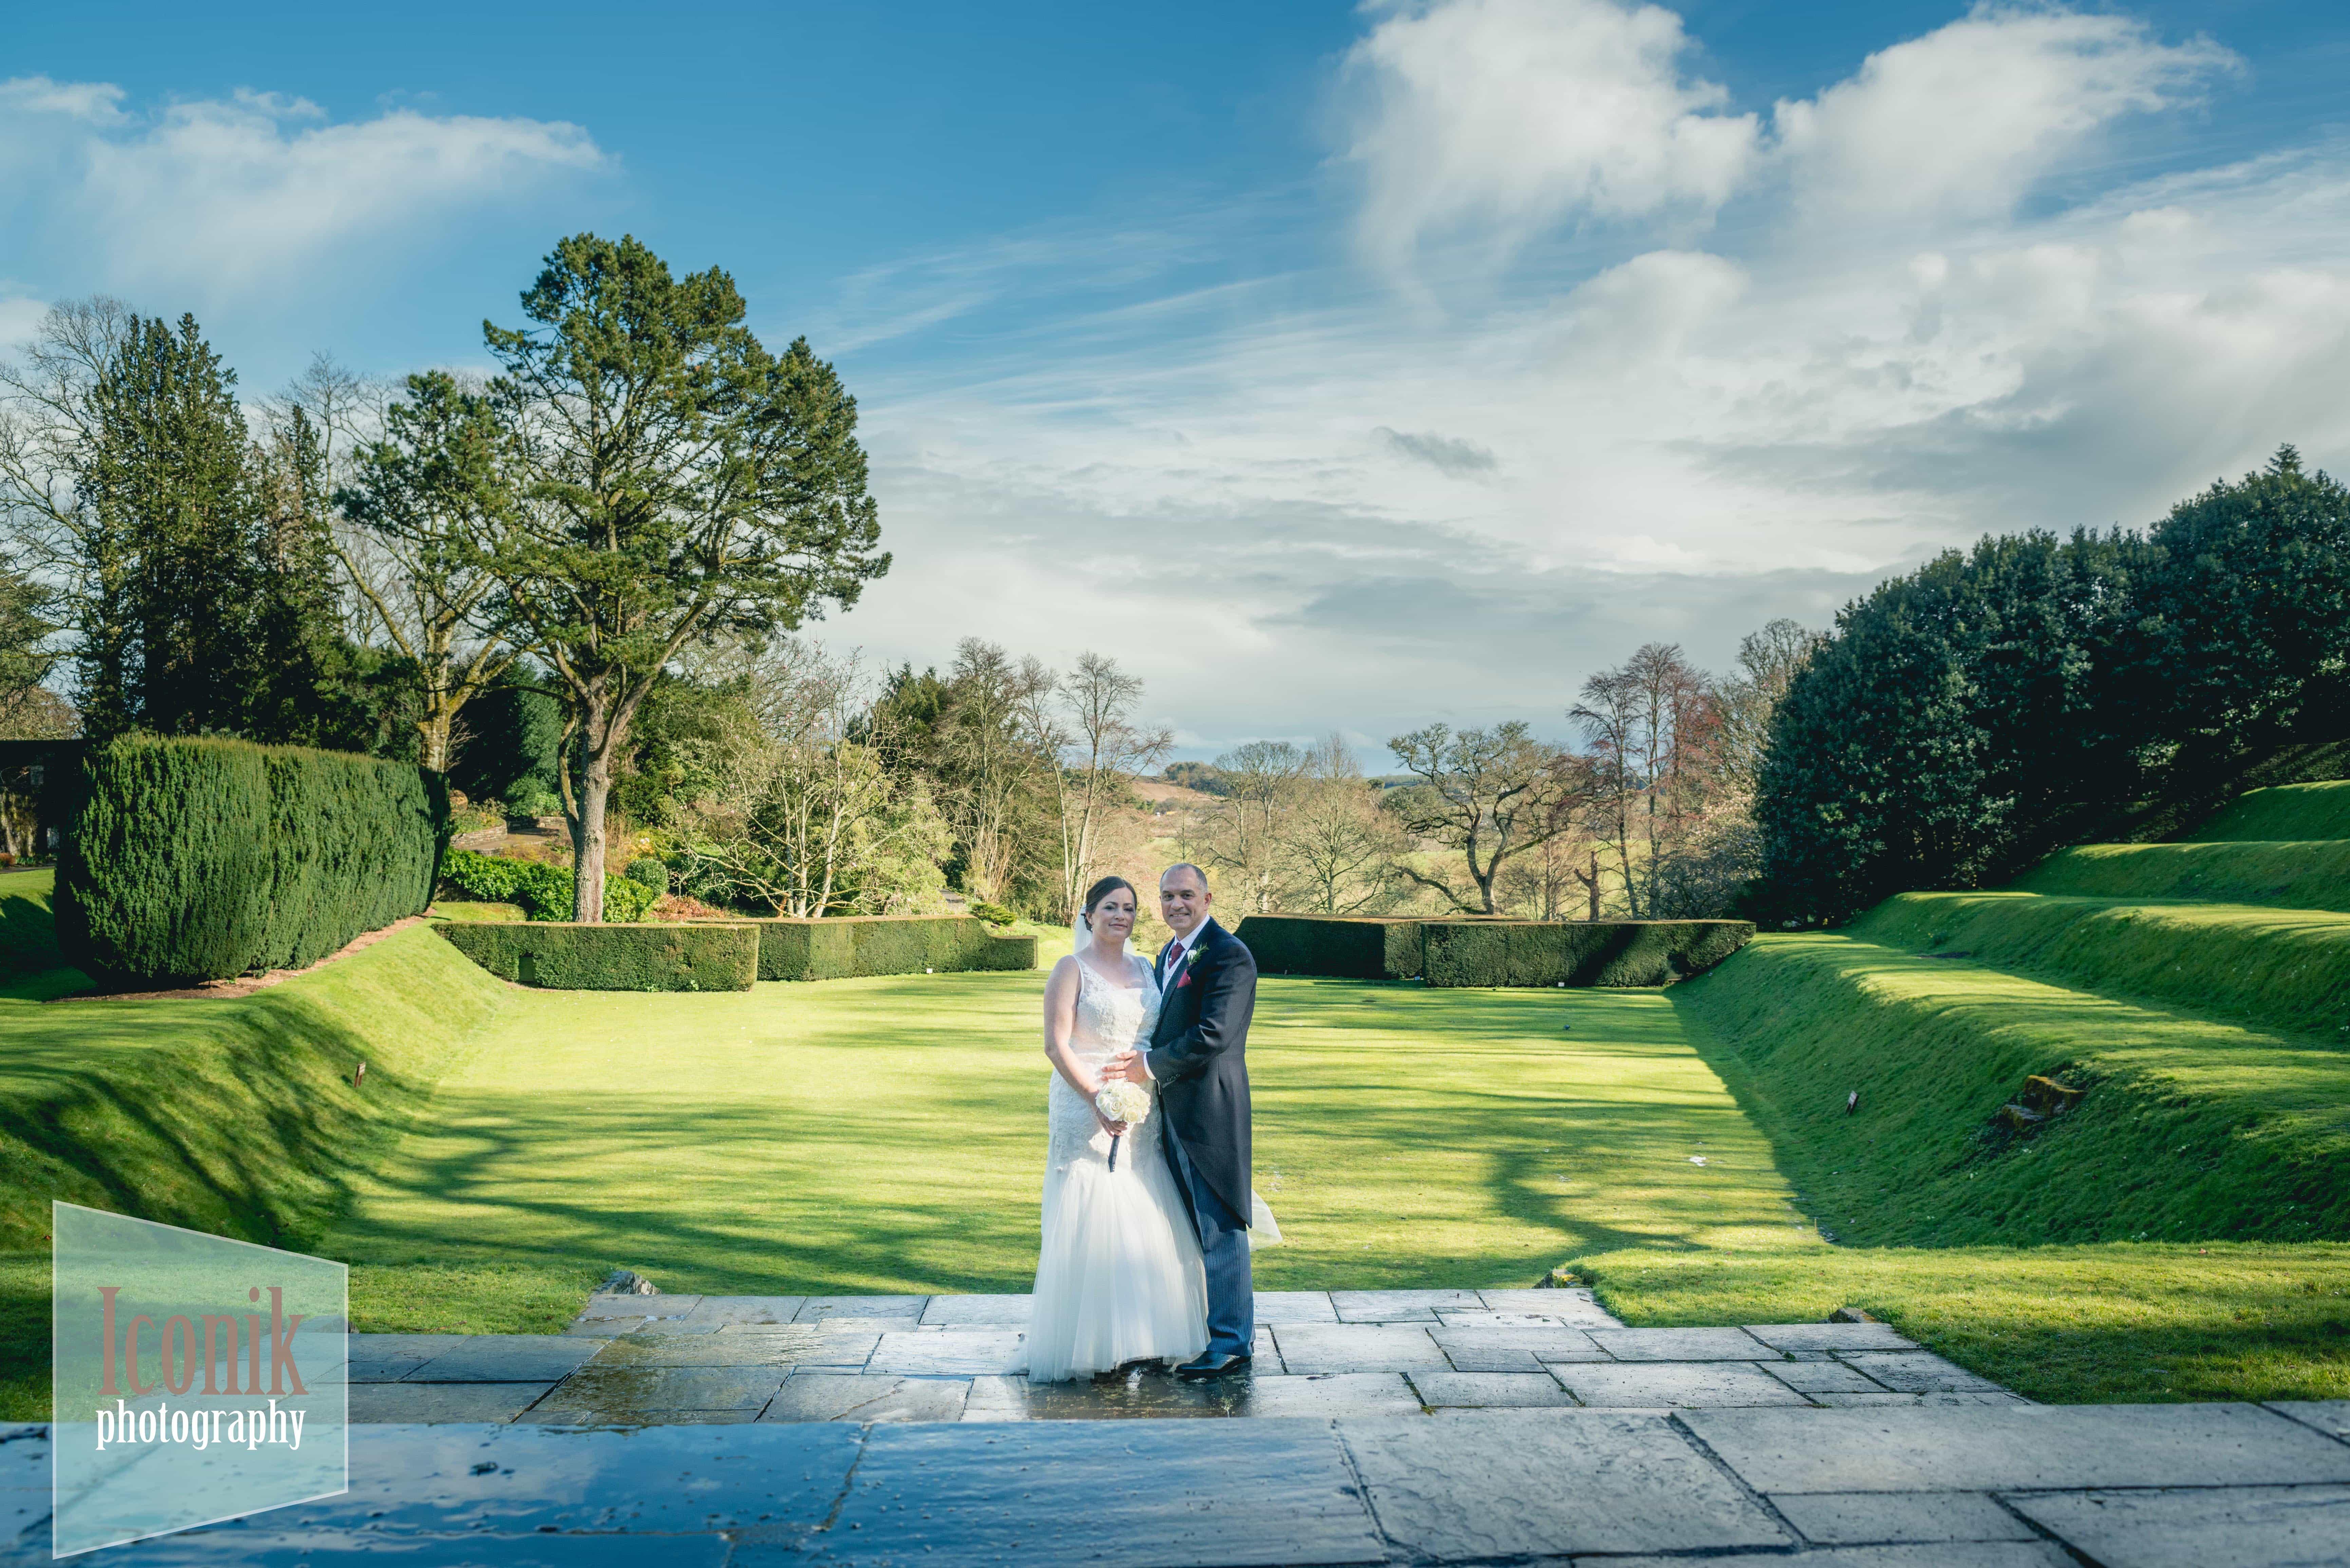 Wedding Photographer Devon and Cornwall at Dartington Hall